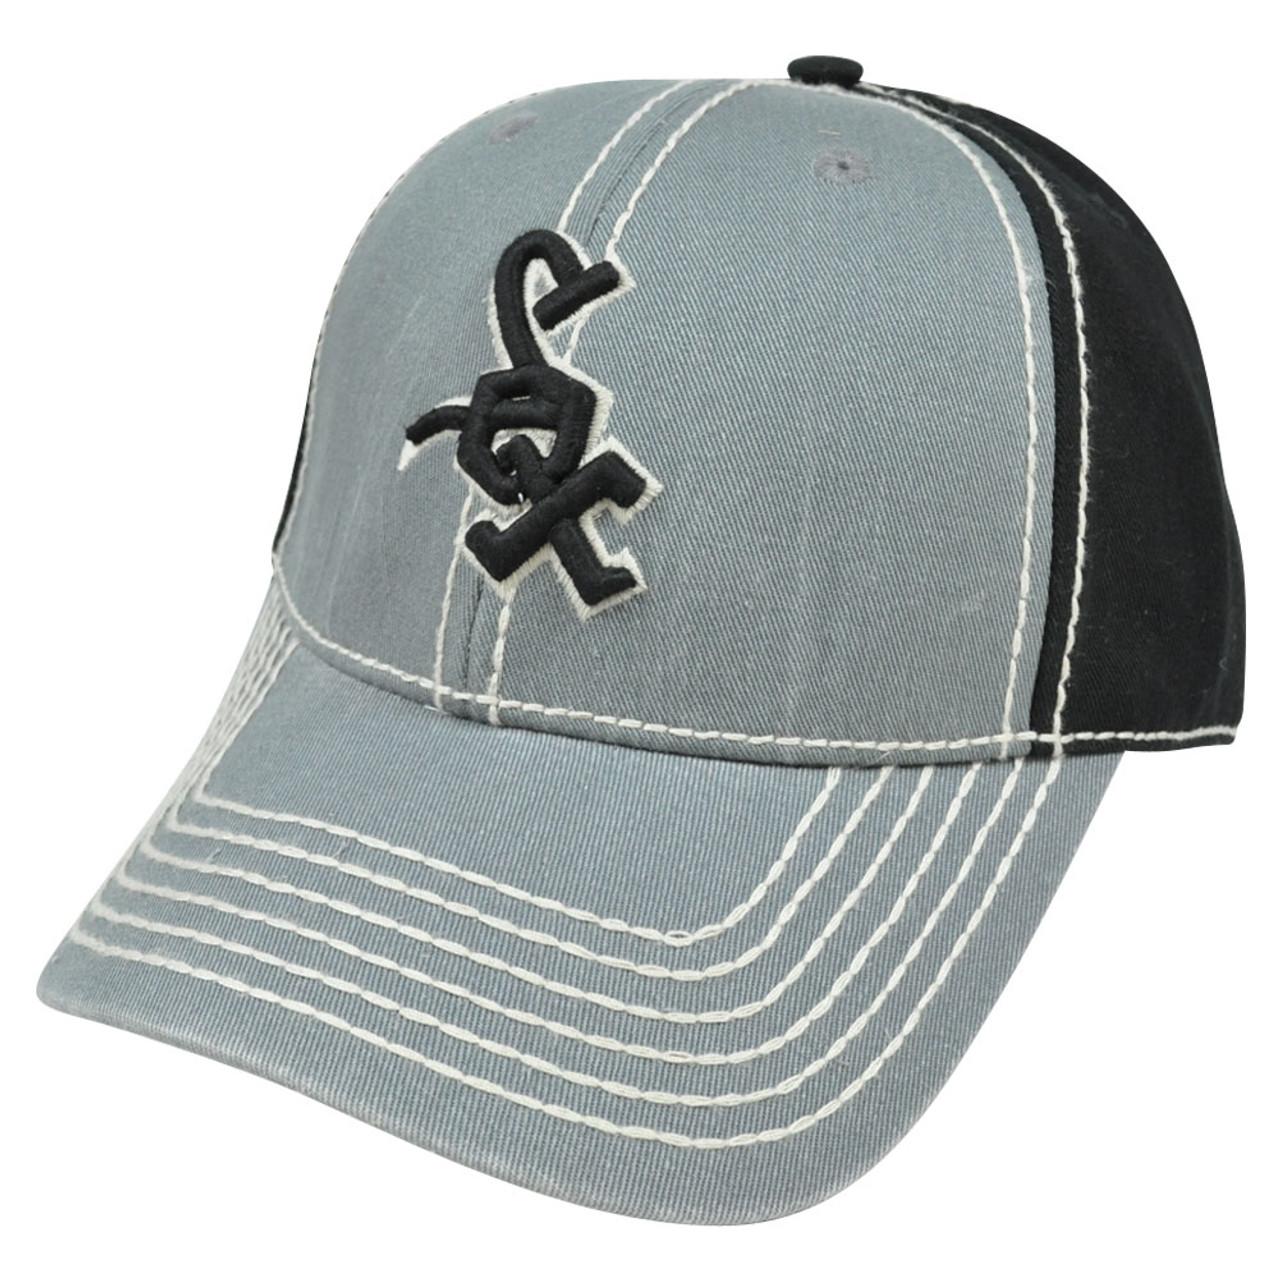 1cd537763e050b MLB Chicago White Sox Pro Stitch American Needle Vintage Washed Cotton Hat  Cap - Cap Store Online.com